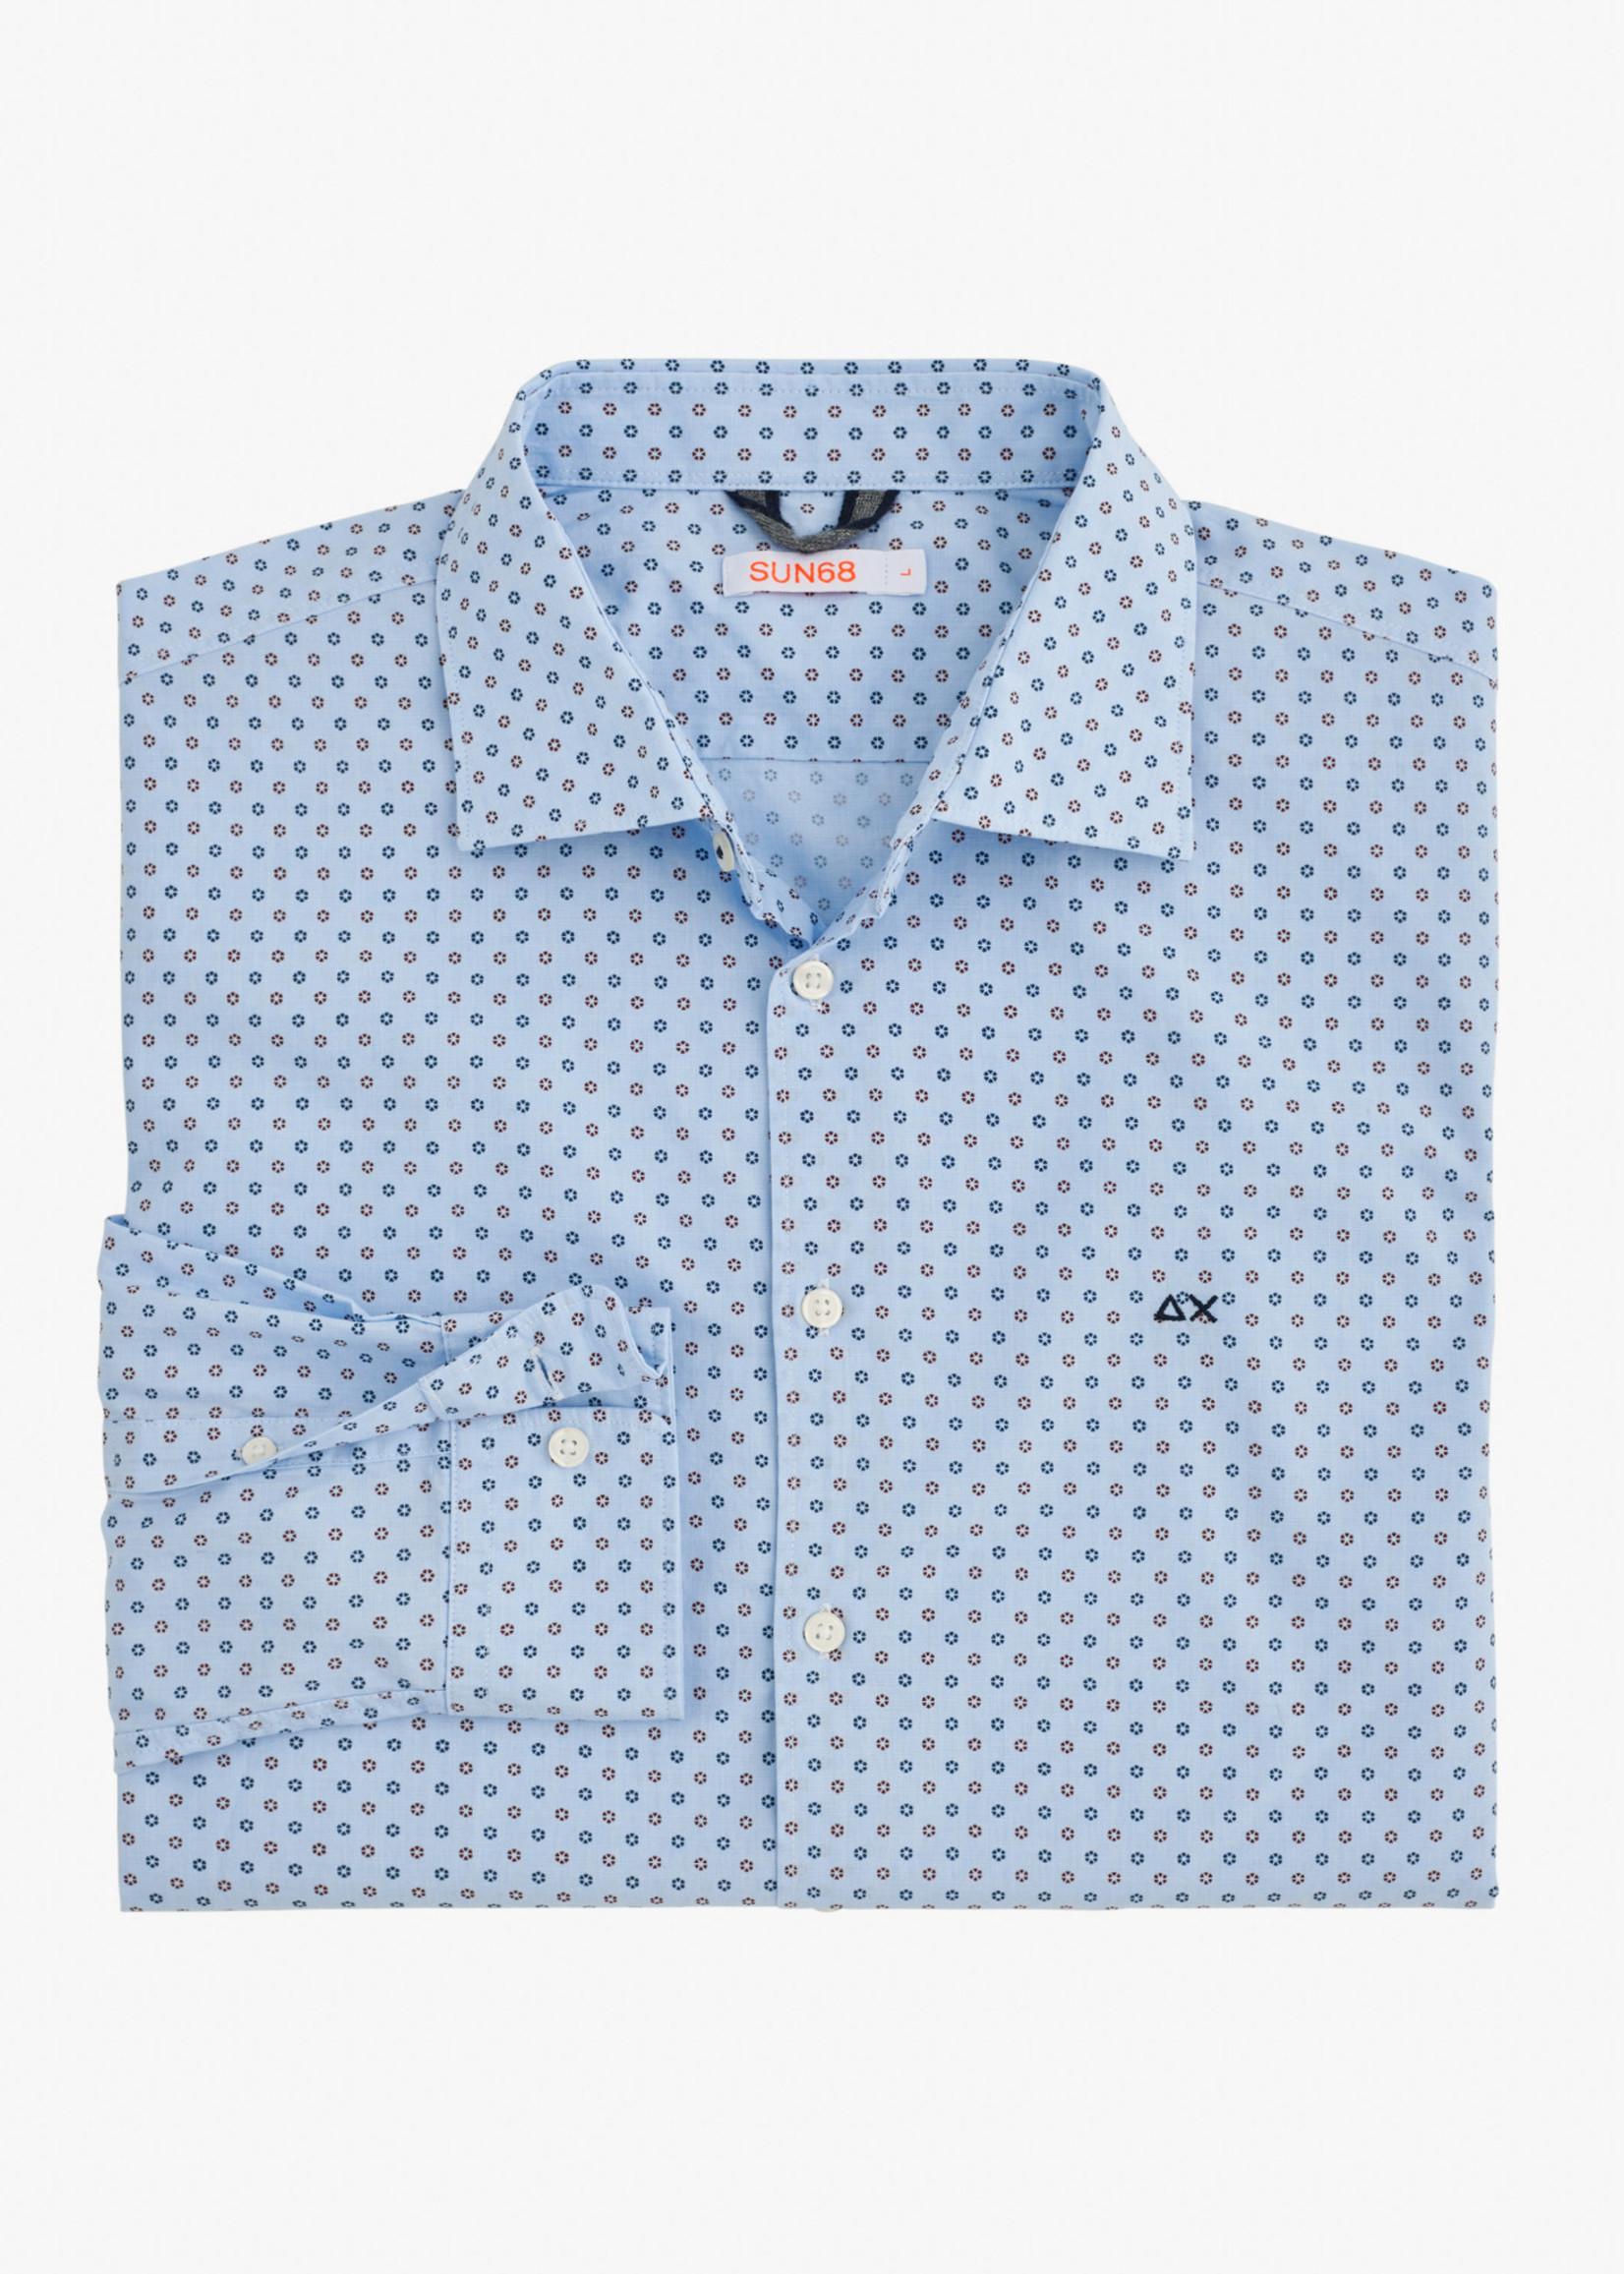 SUN68 Shirt Details French Collar L/S | Blue/Red | SUN68